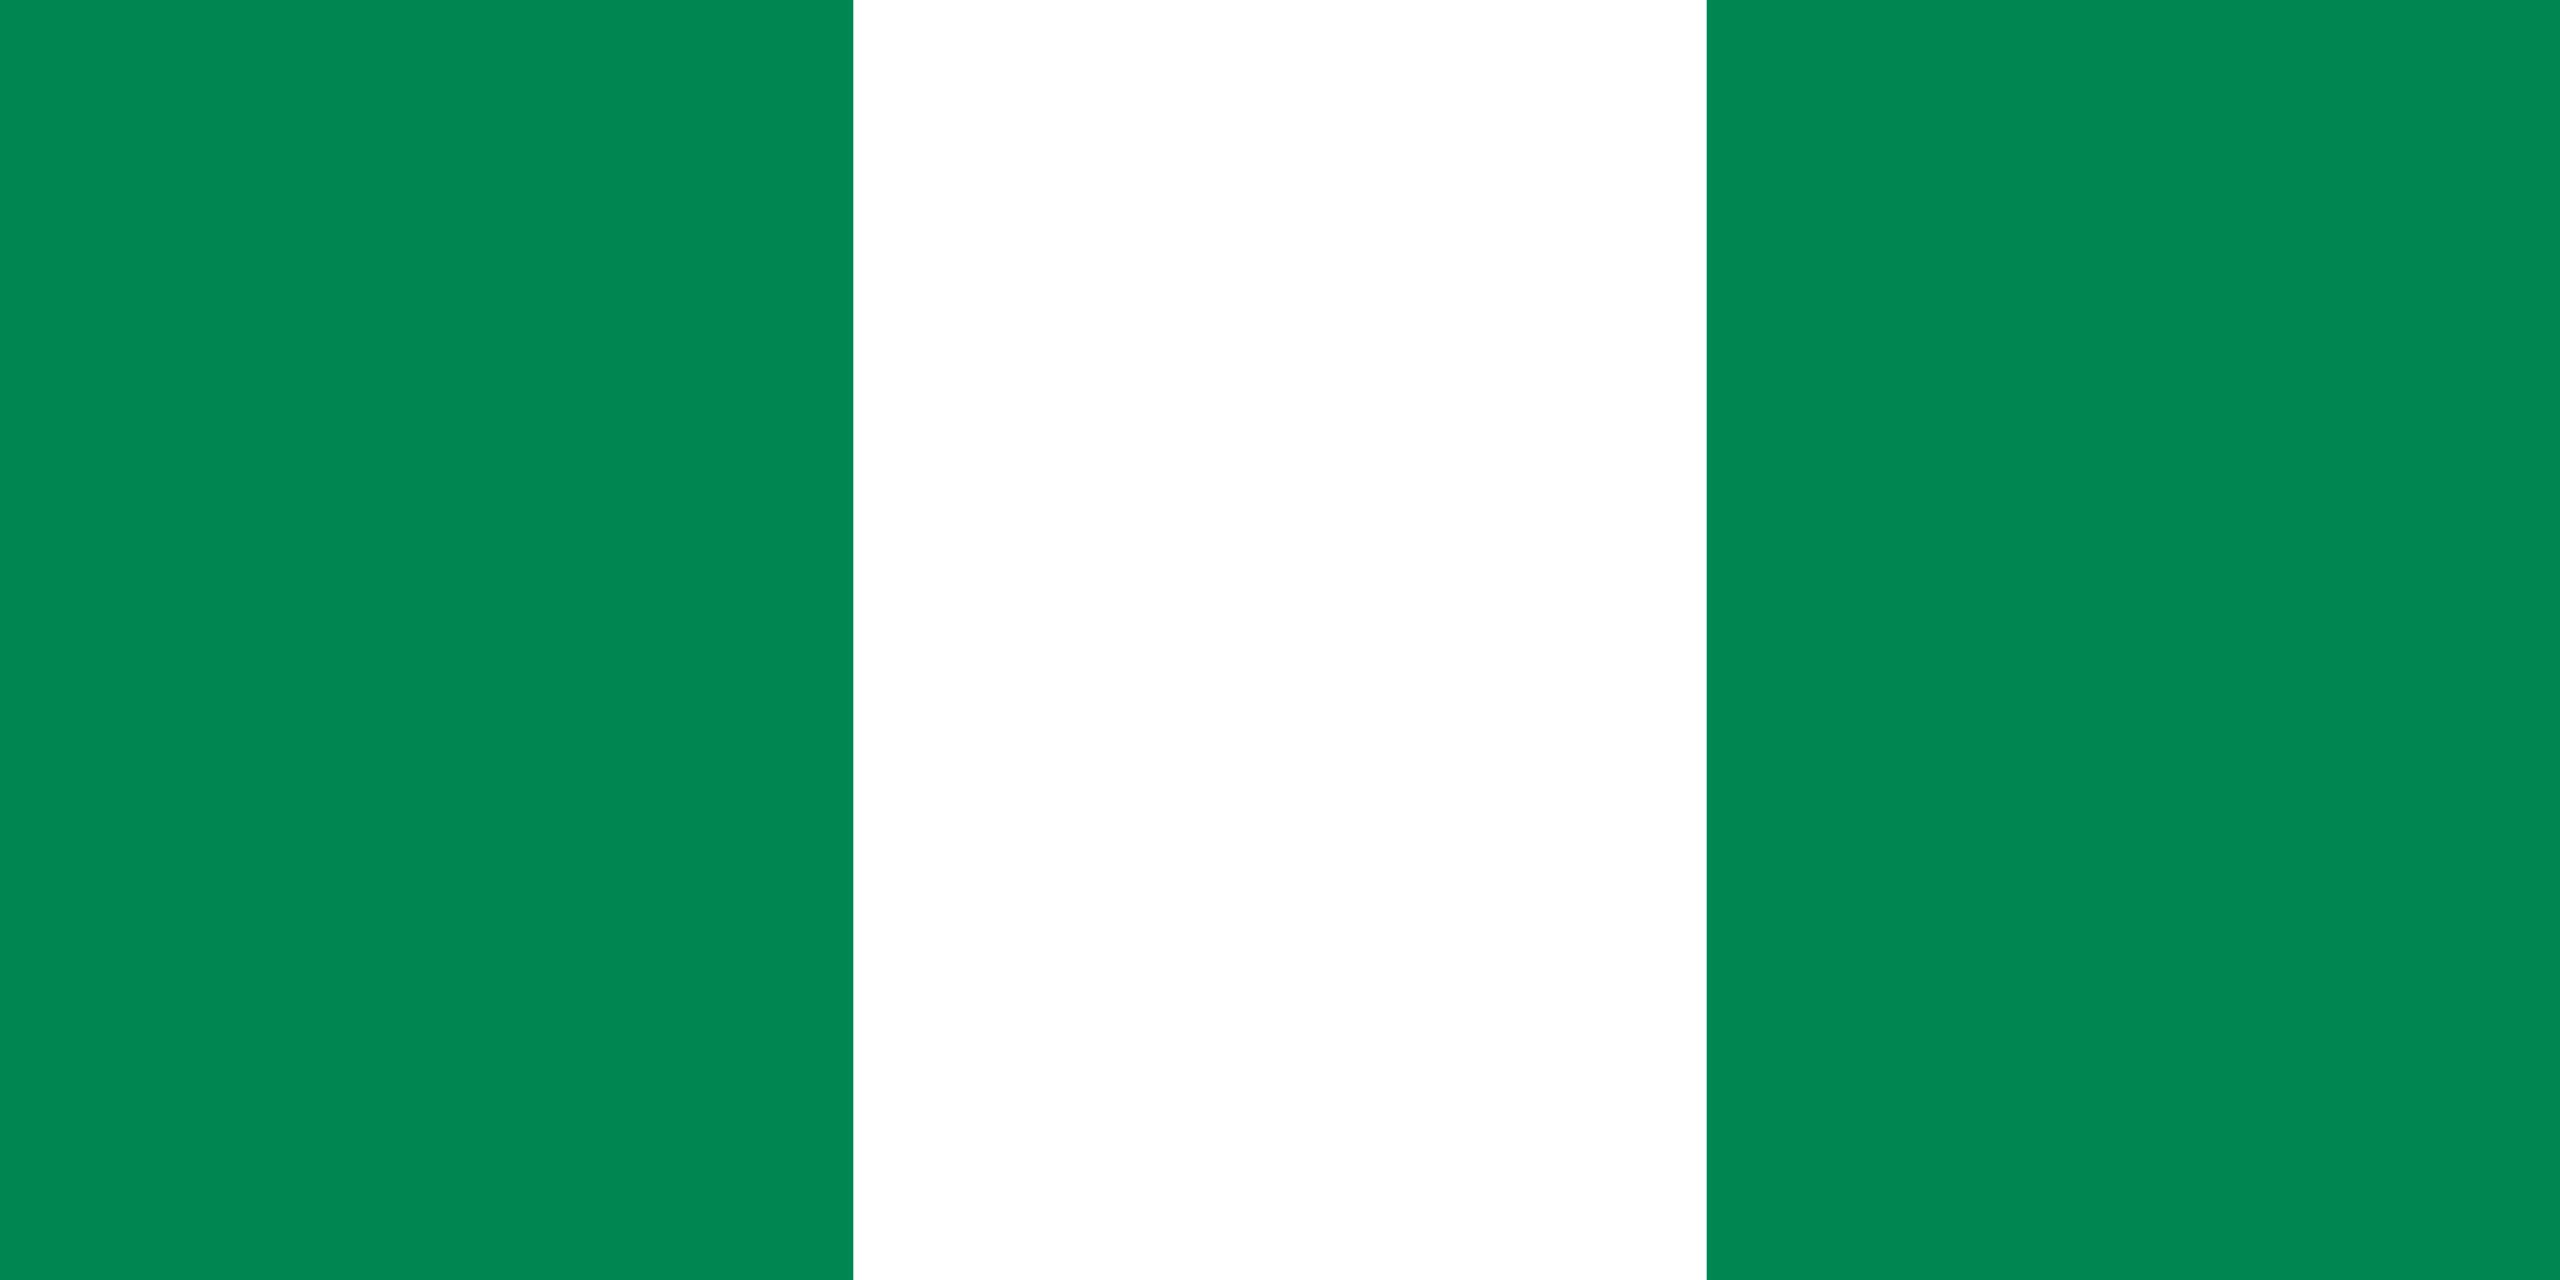 Celebrating our diversity! Nigeria & Hong Kong!